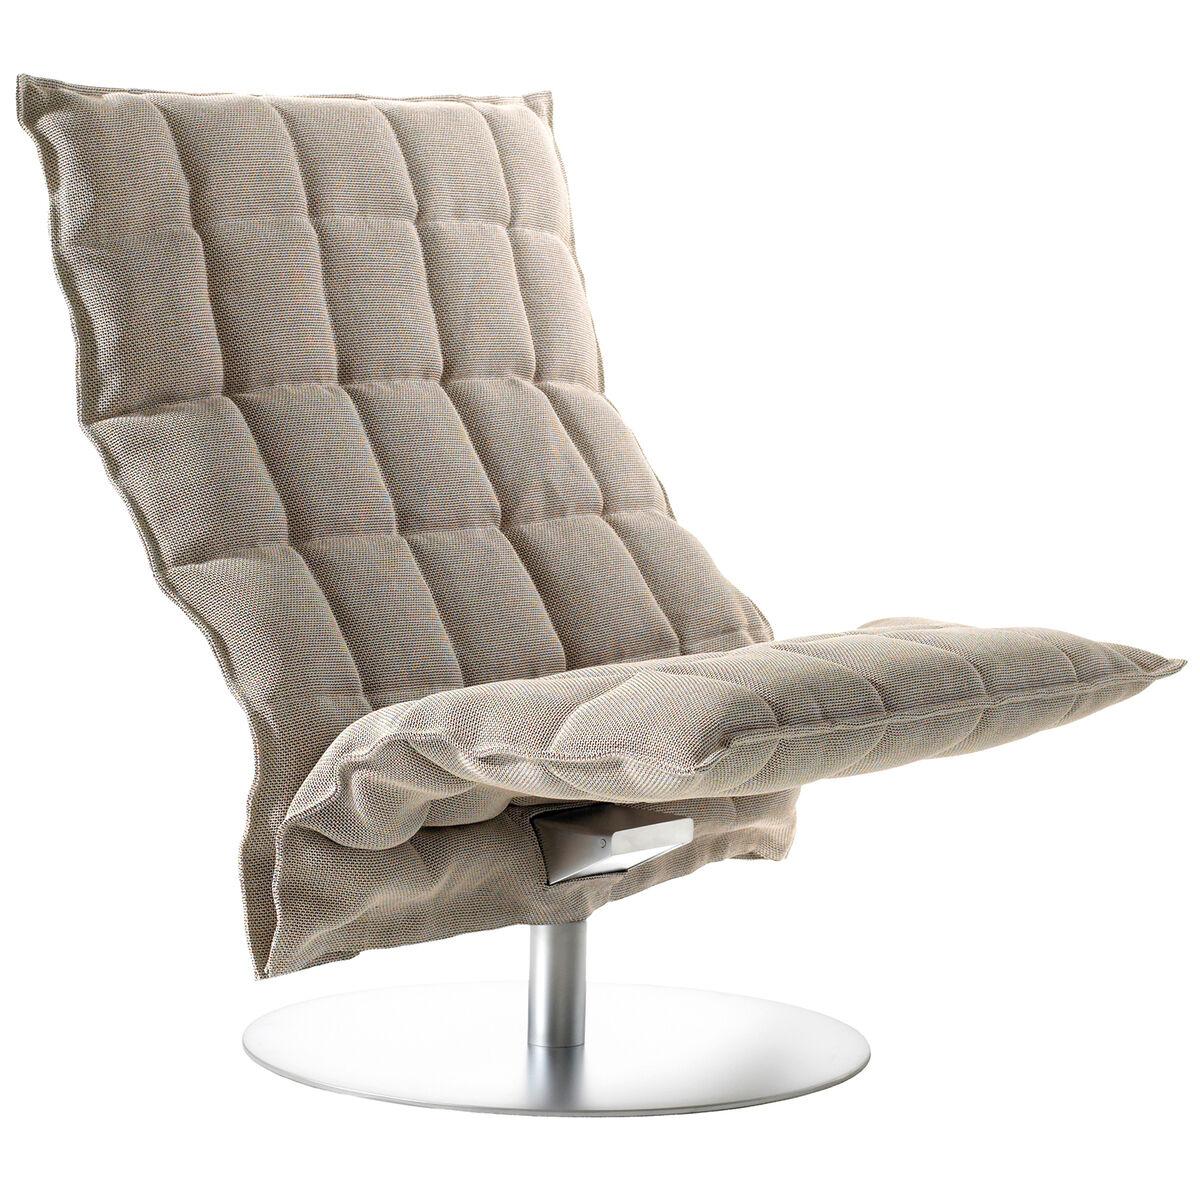 Woodnotes K tuoli, py�riv�, leve�, kitti/musta